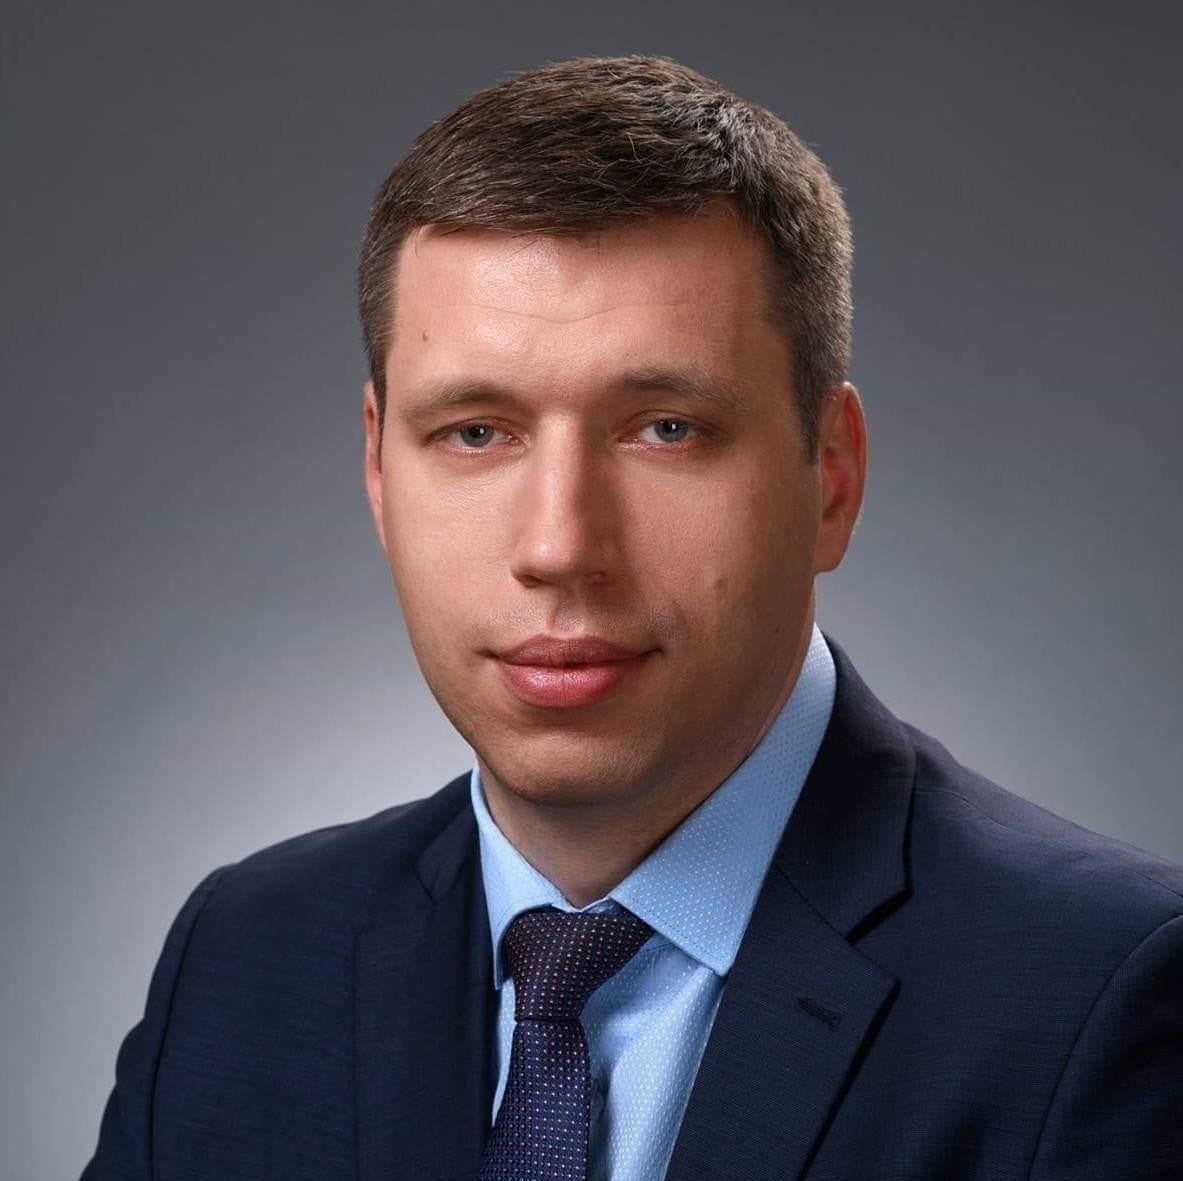 Луцик Павел Иванович, директор по продажам и развитию бизнеса